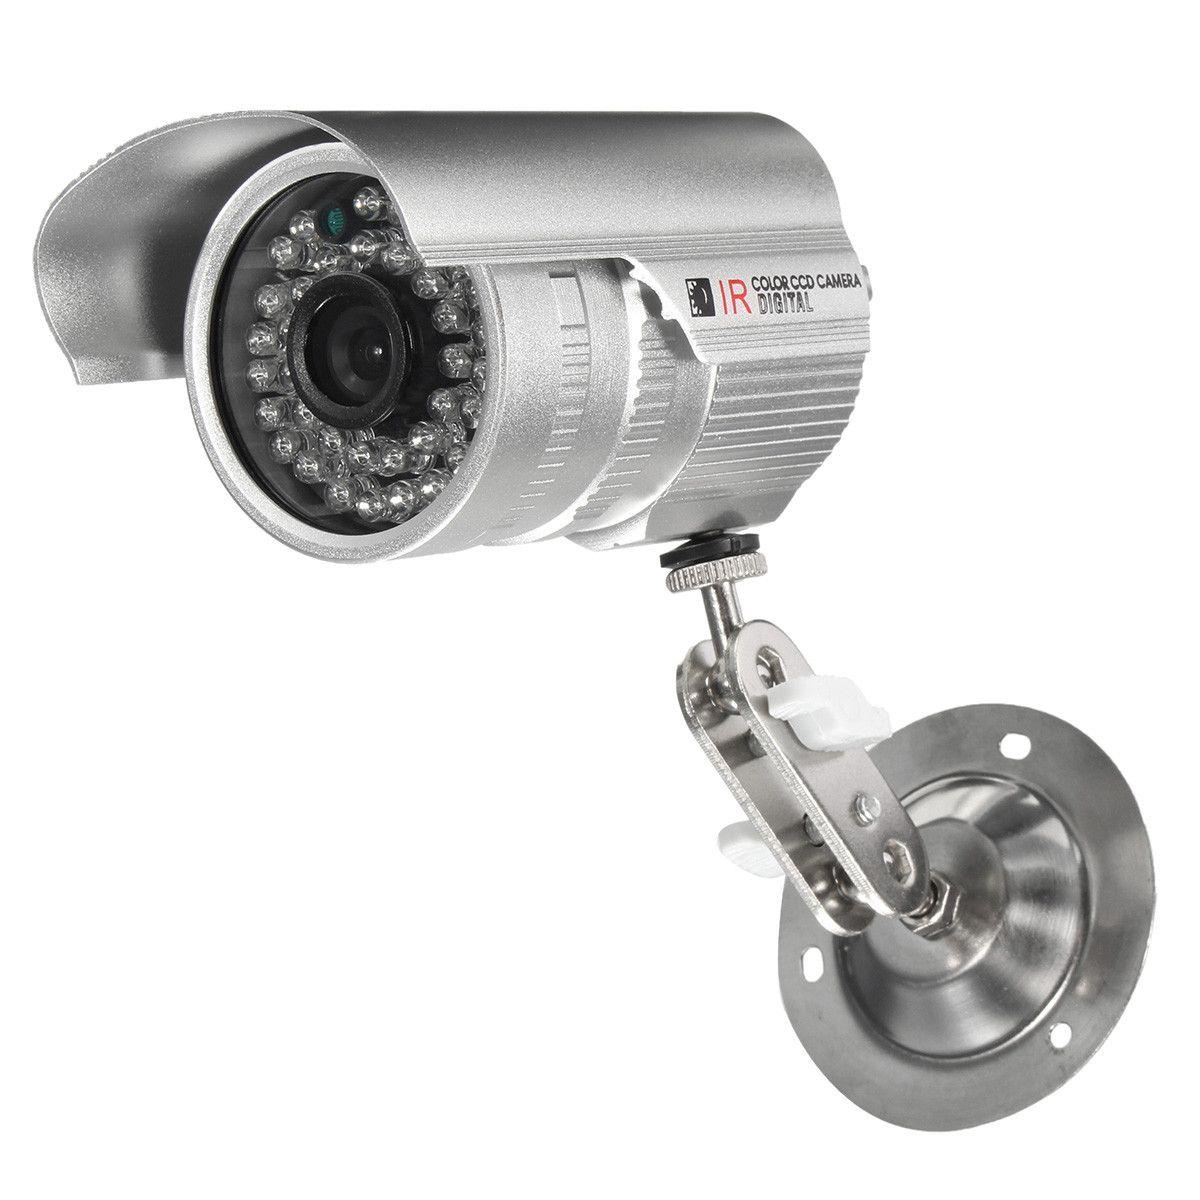 1200tvl Waterproof Outdoor Cctv Security Camera Ir Color Balance Night Vision Security Cameras For Home Security Camera Ideas Security Camera Installation